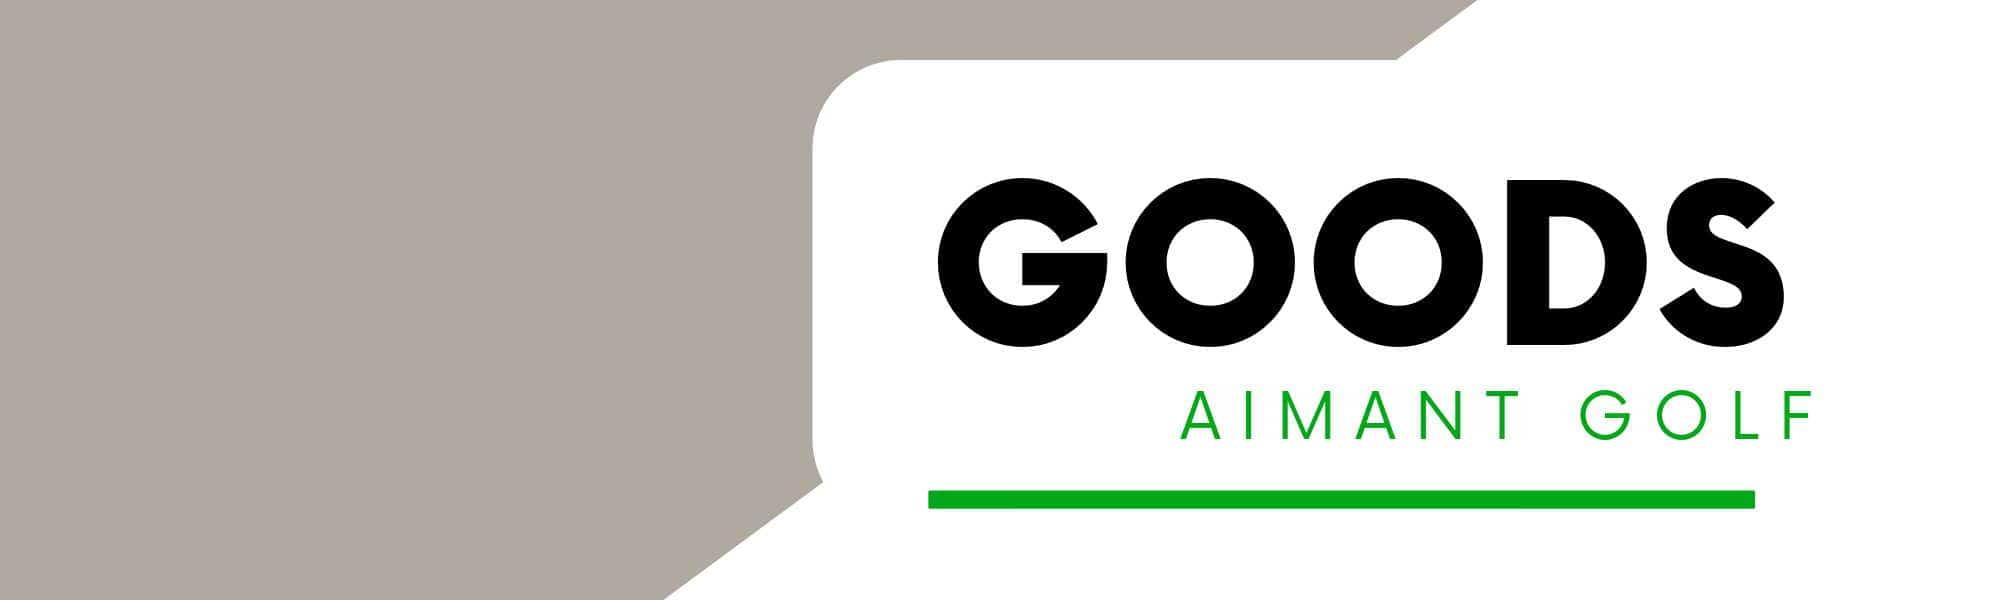 AIMANT GOLF GOODS